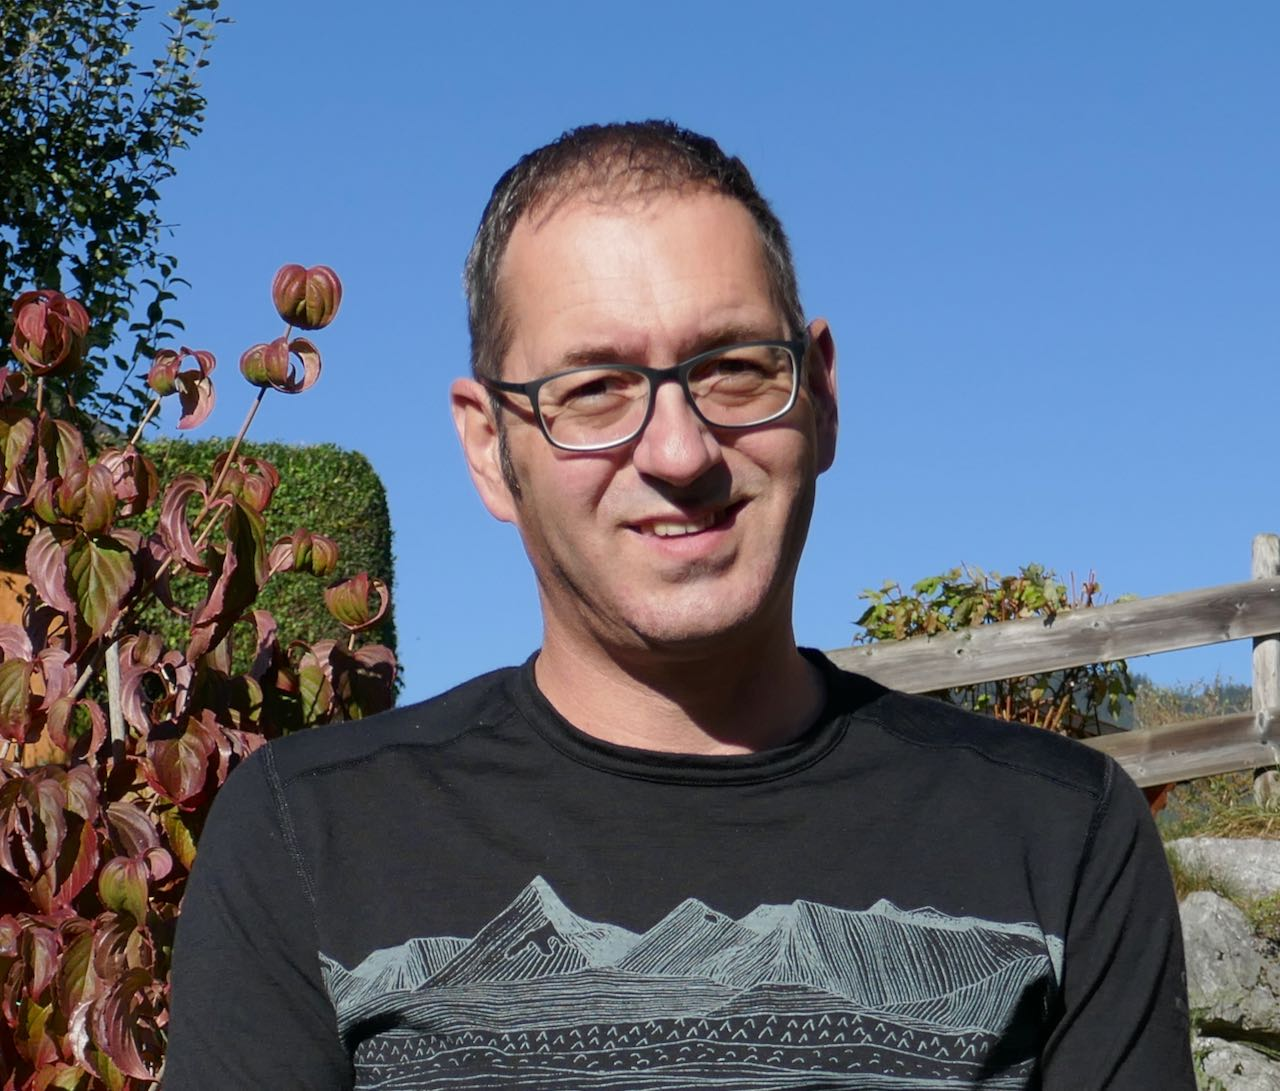 Heilpraktiker Paul Köck